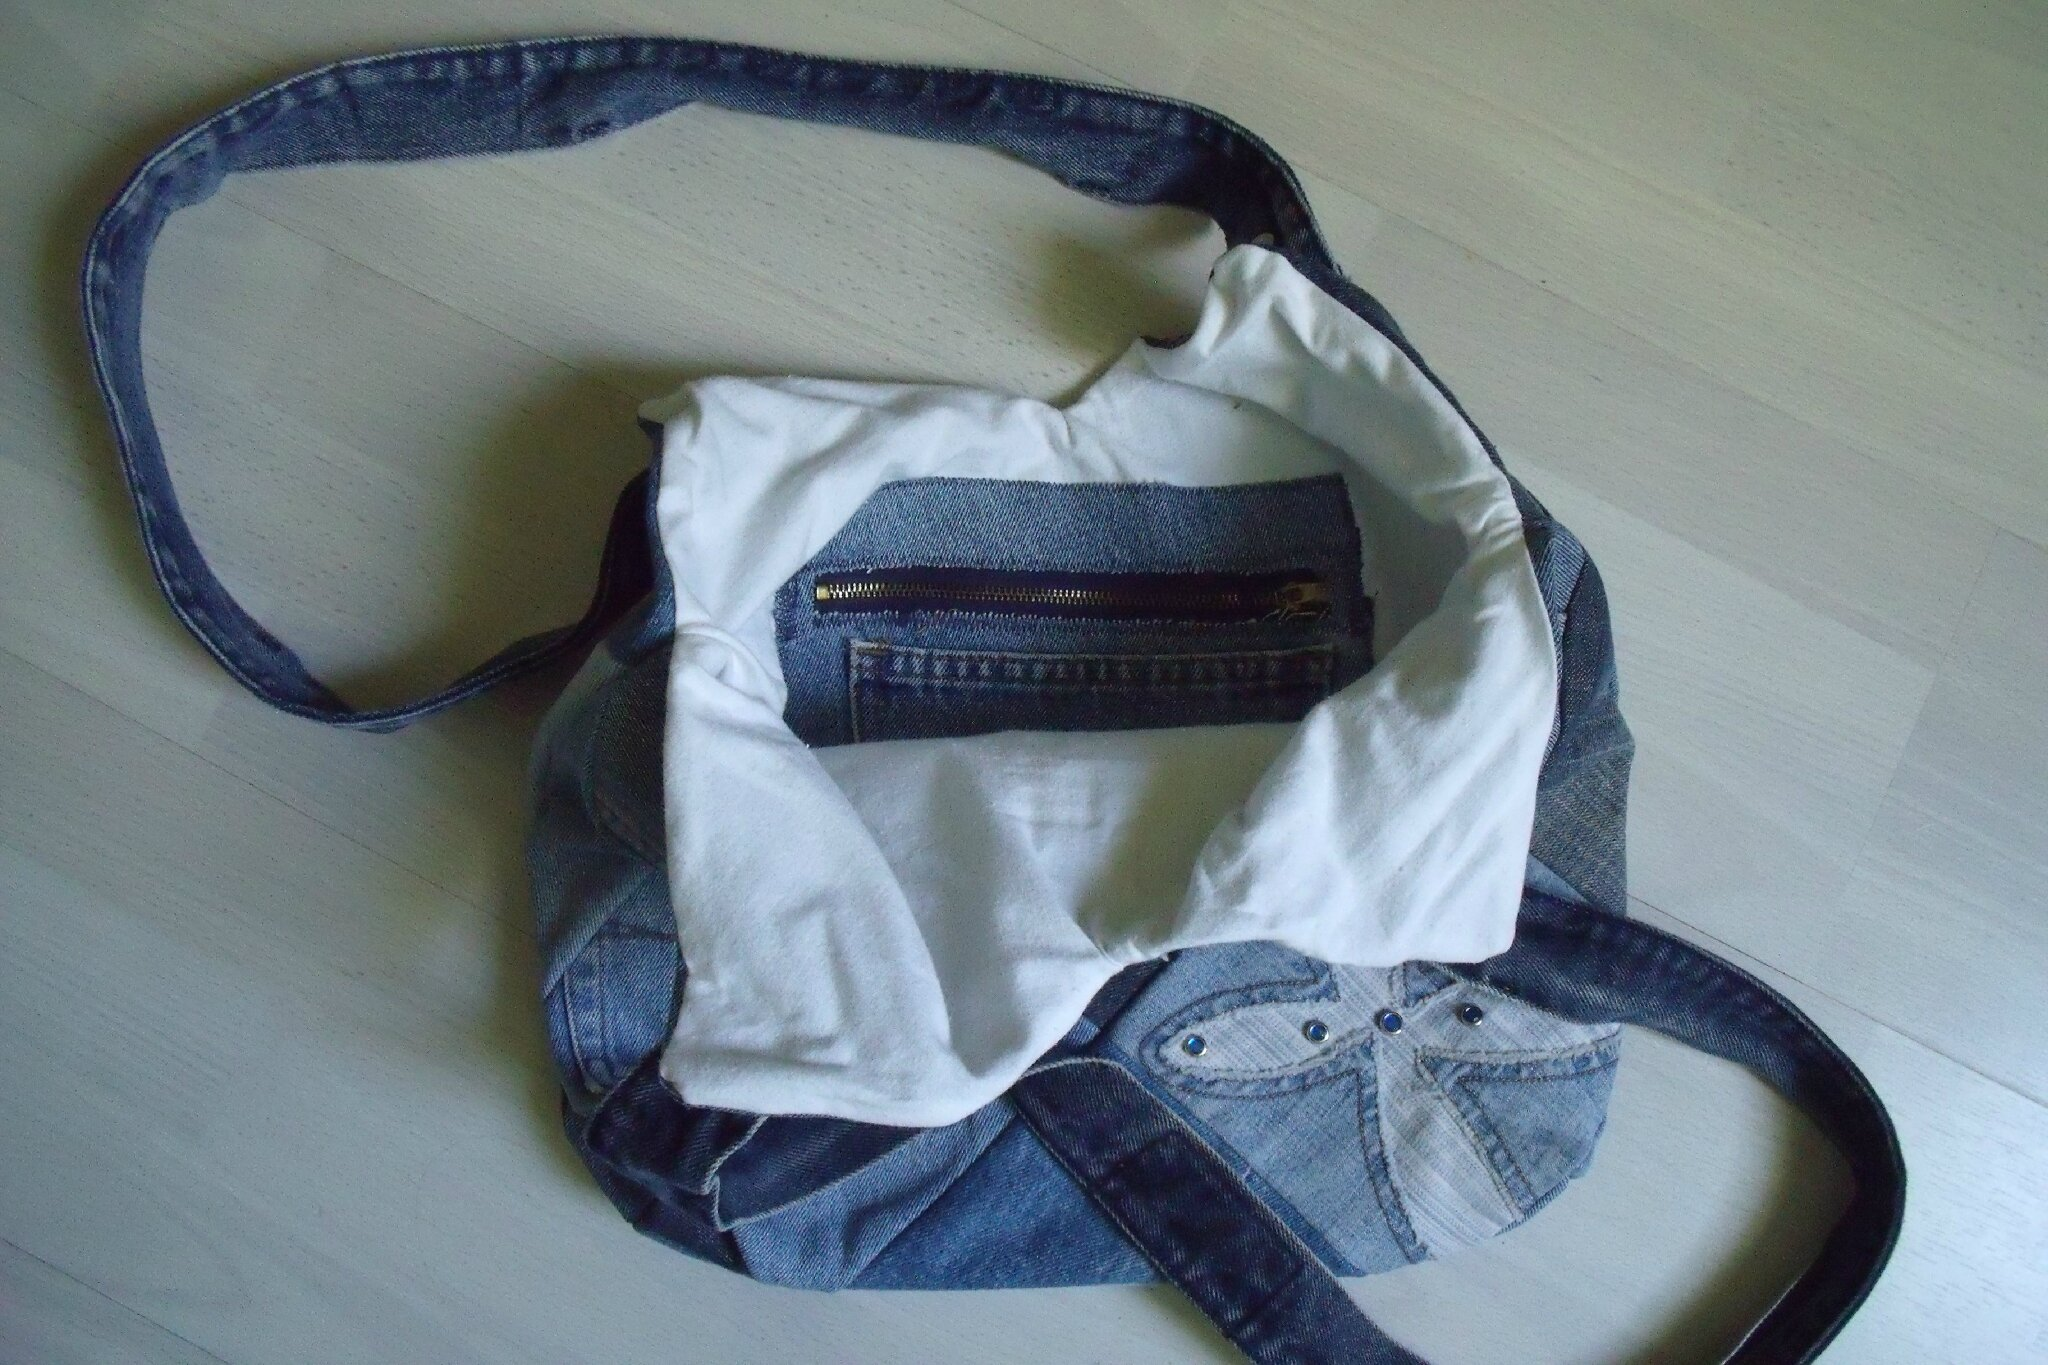 sac jeans 2 interieur